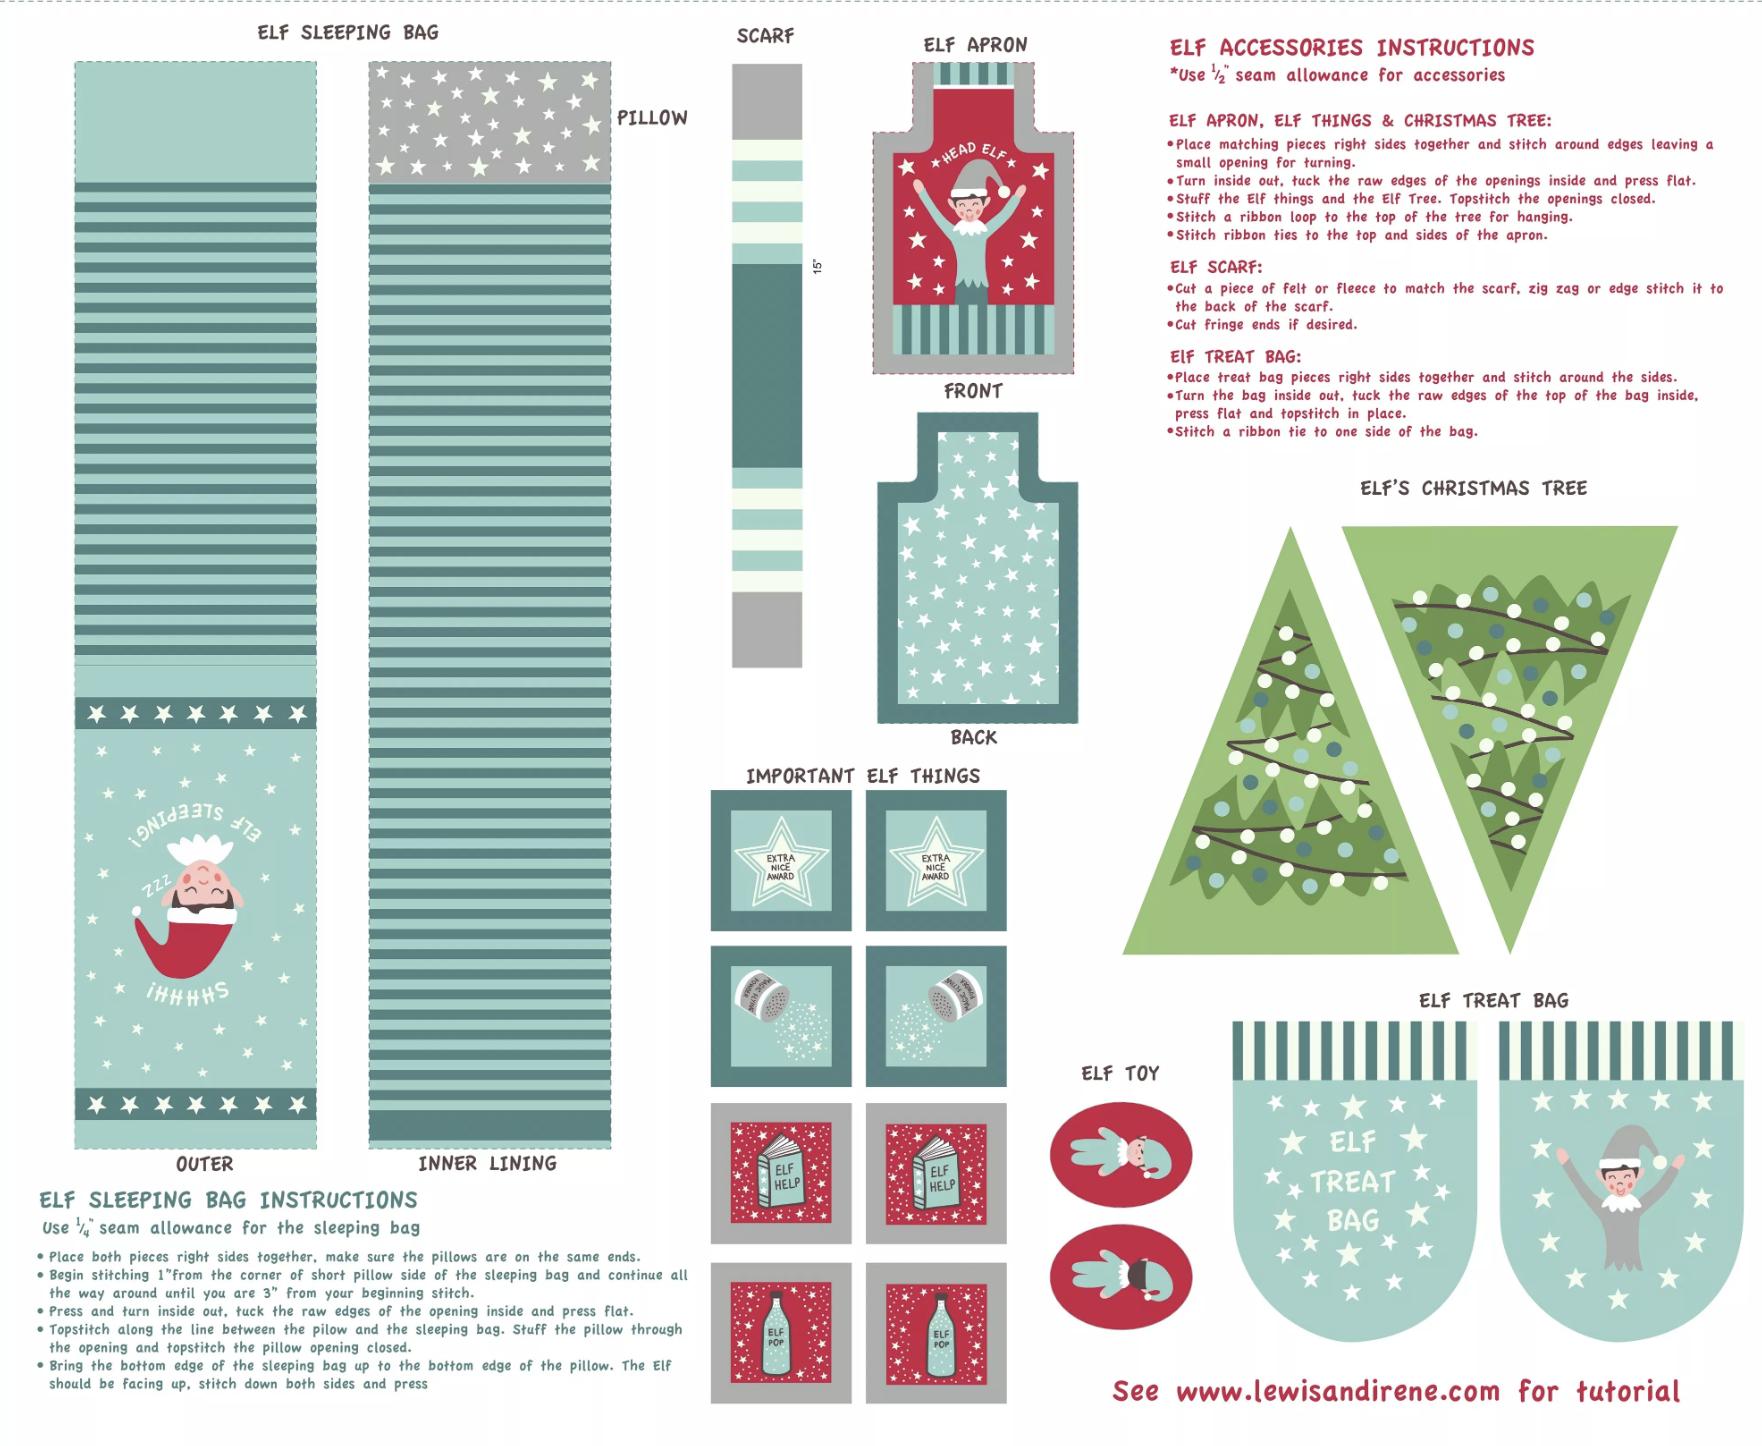 Lewis & Irene Christmas Glow - Elf Accessories Panel (Blue)